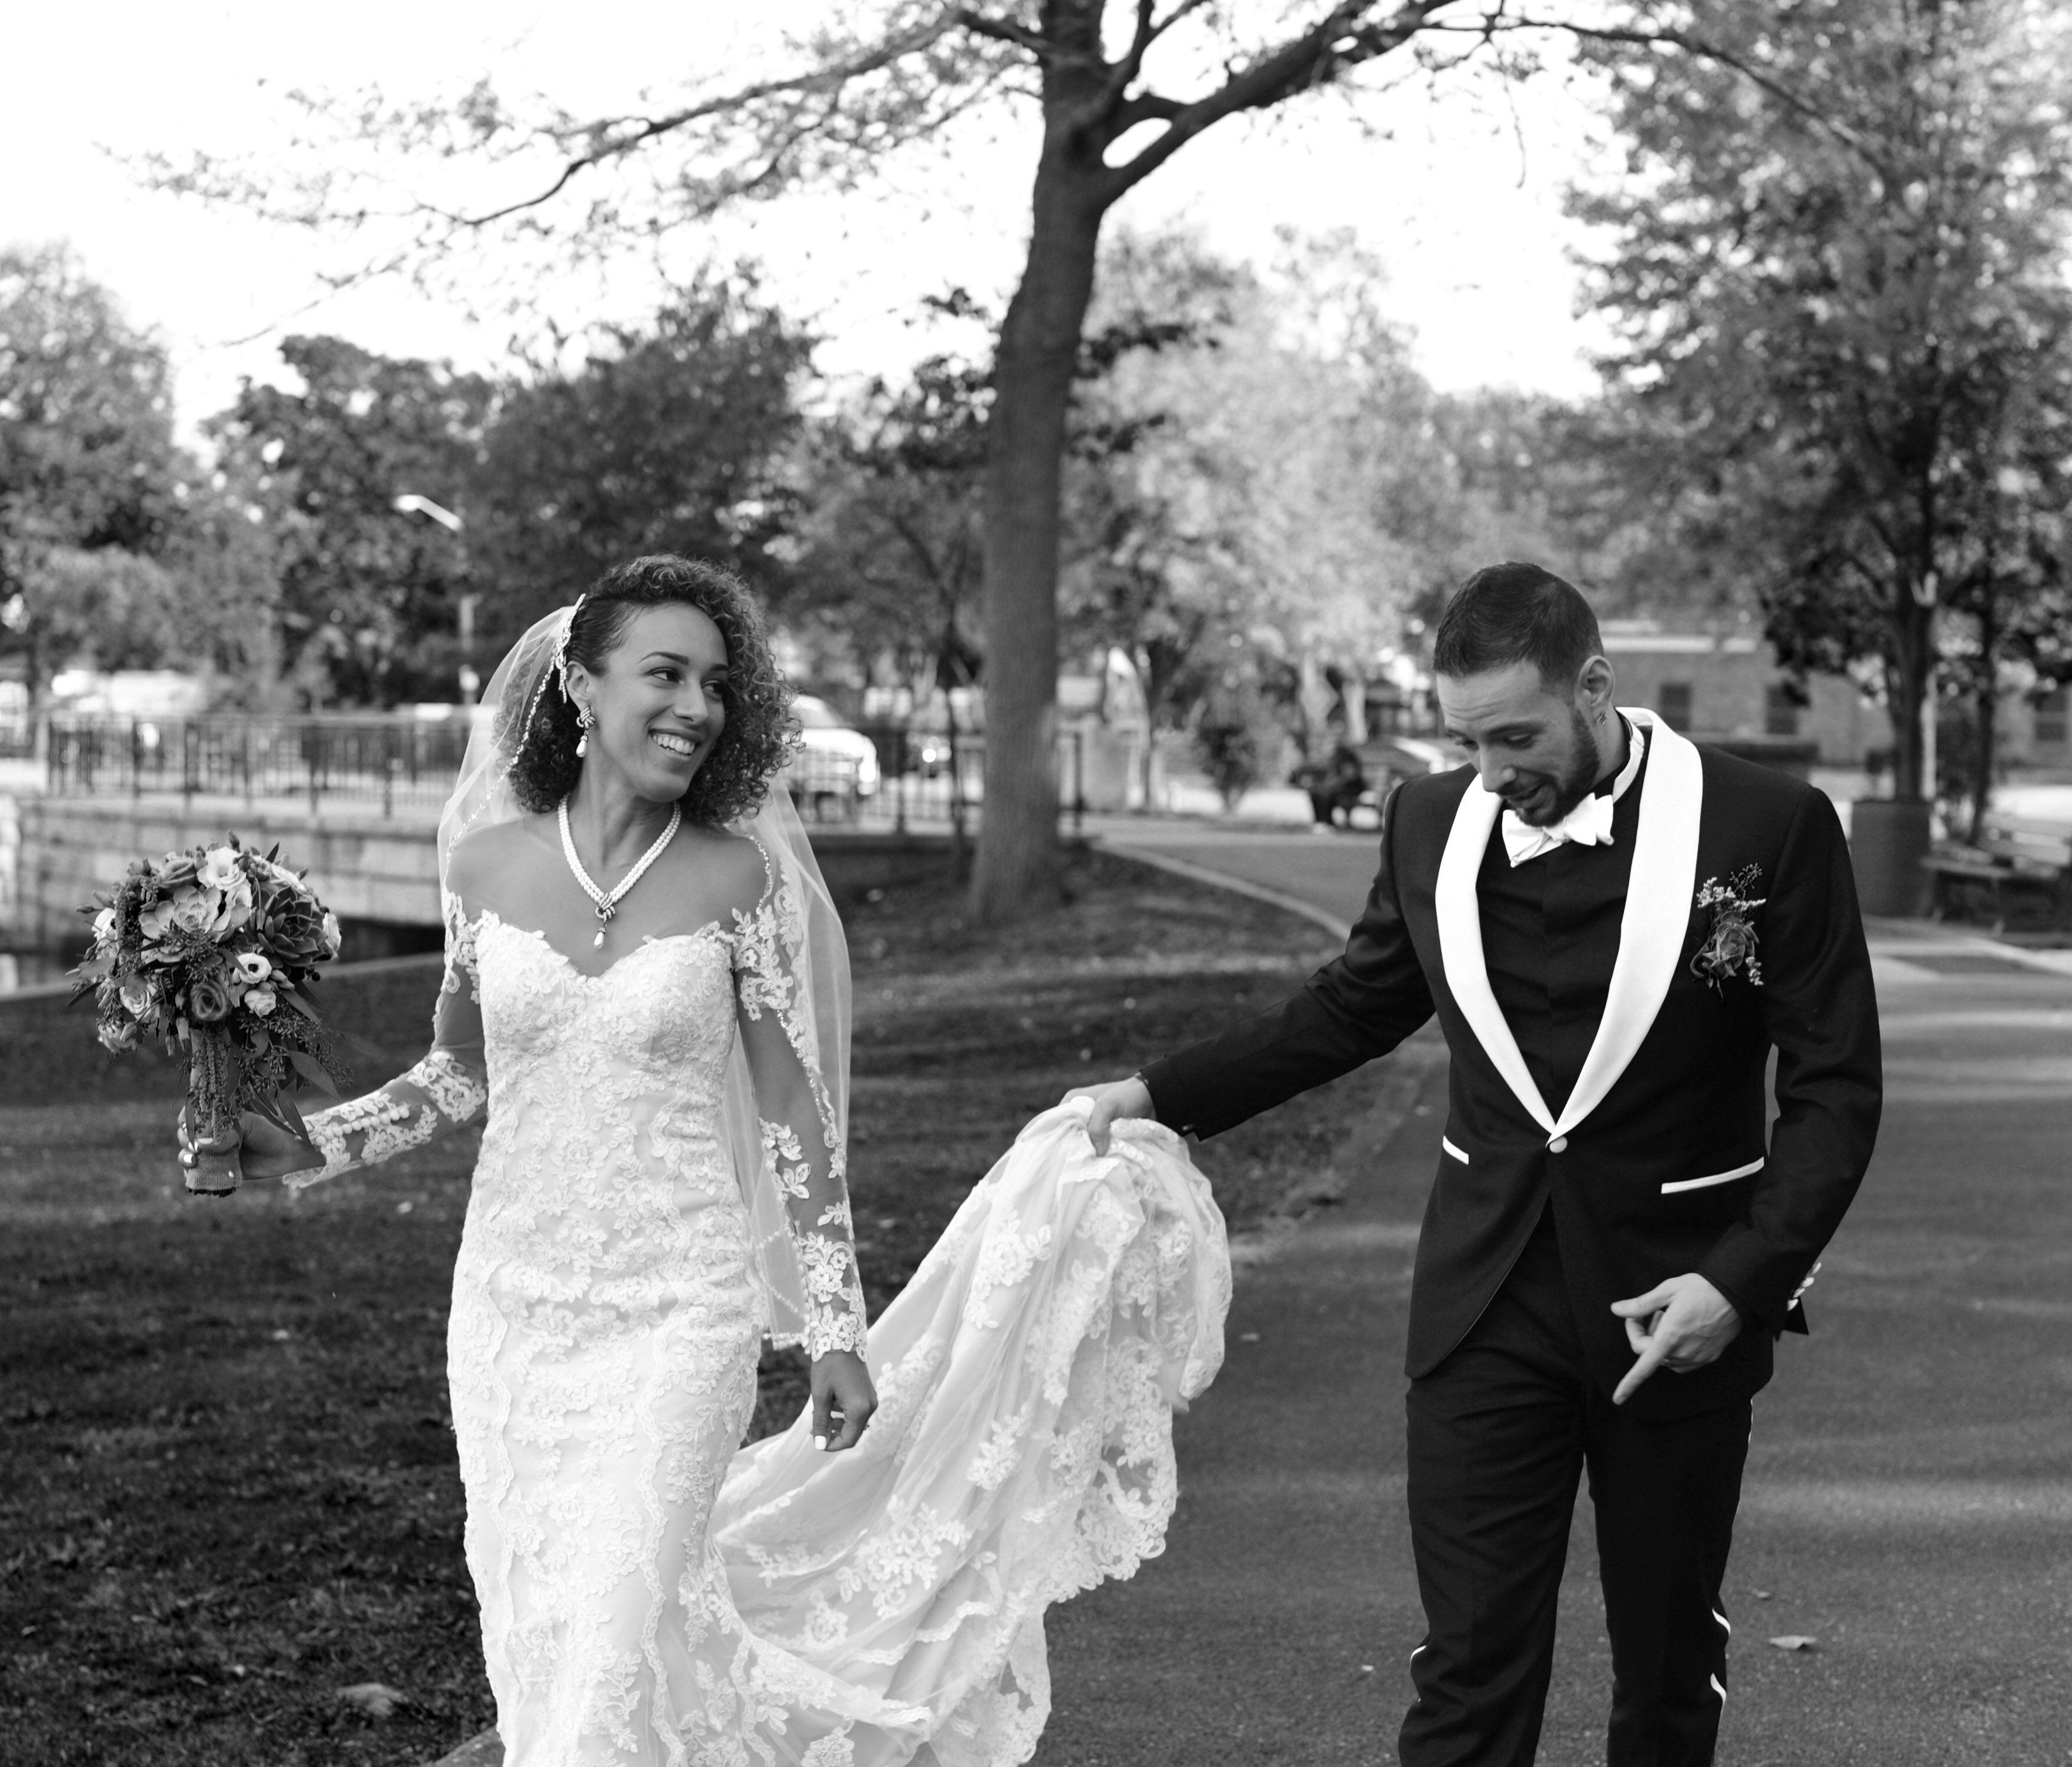 Natural curly wedding hair long sleeve stella york wedding dress